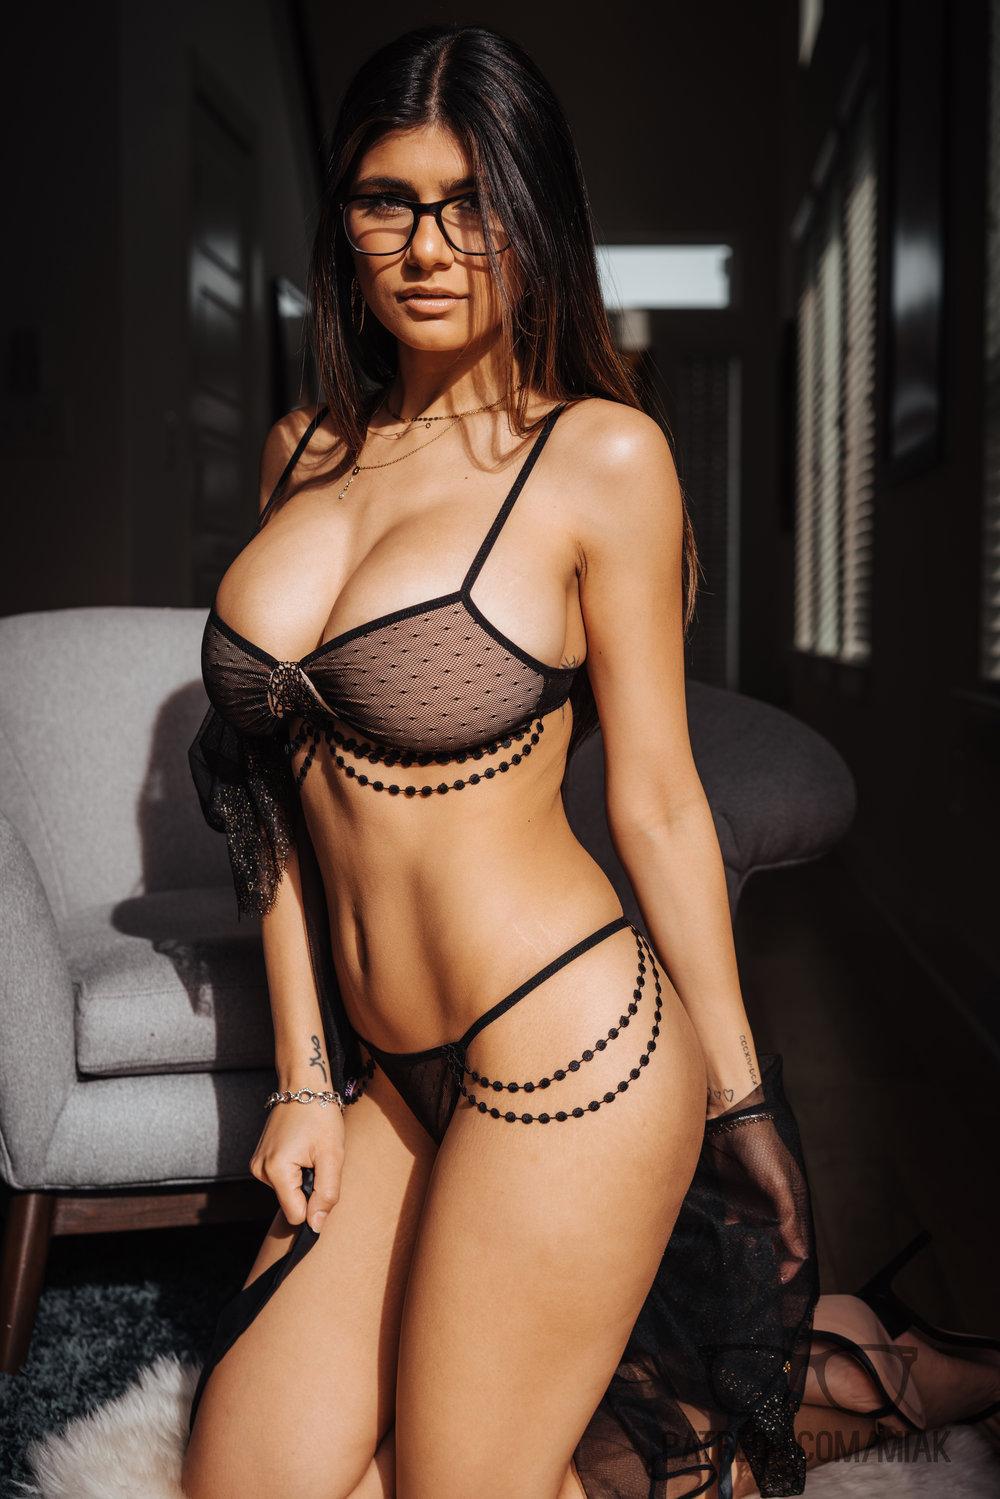 Mia Khalifa Lingerie Stiletto Heels Photoshoot Leaked 0011